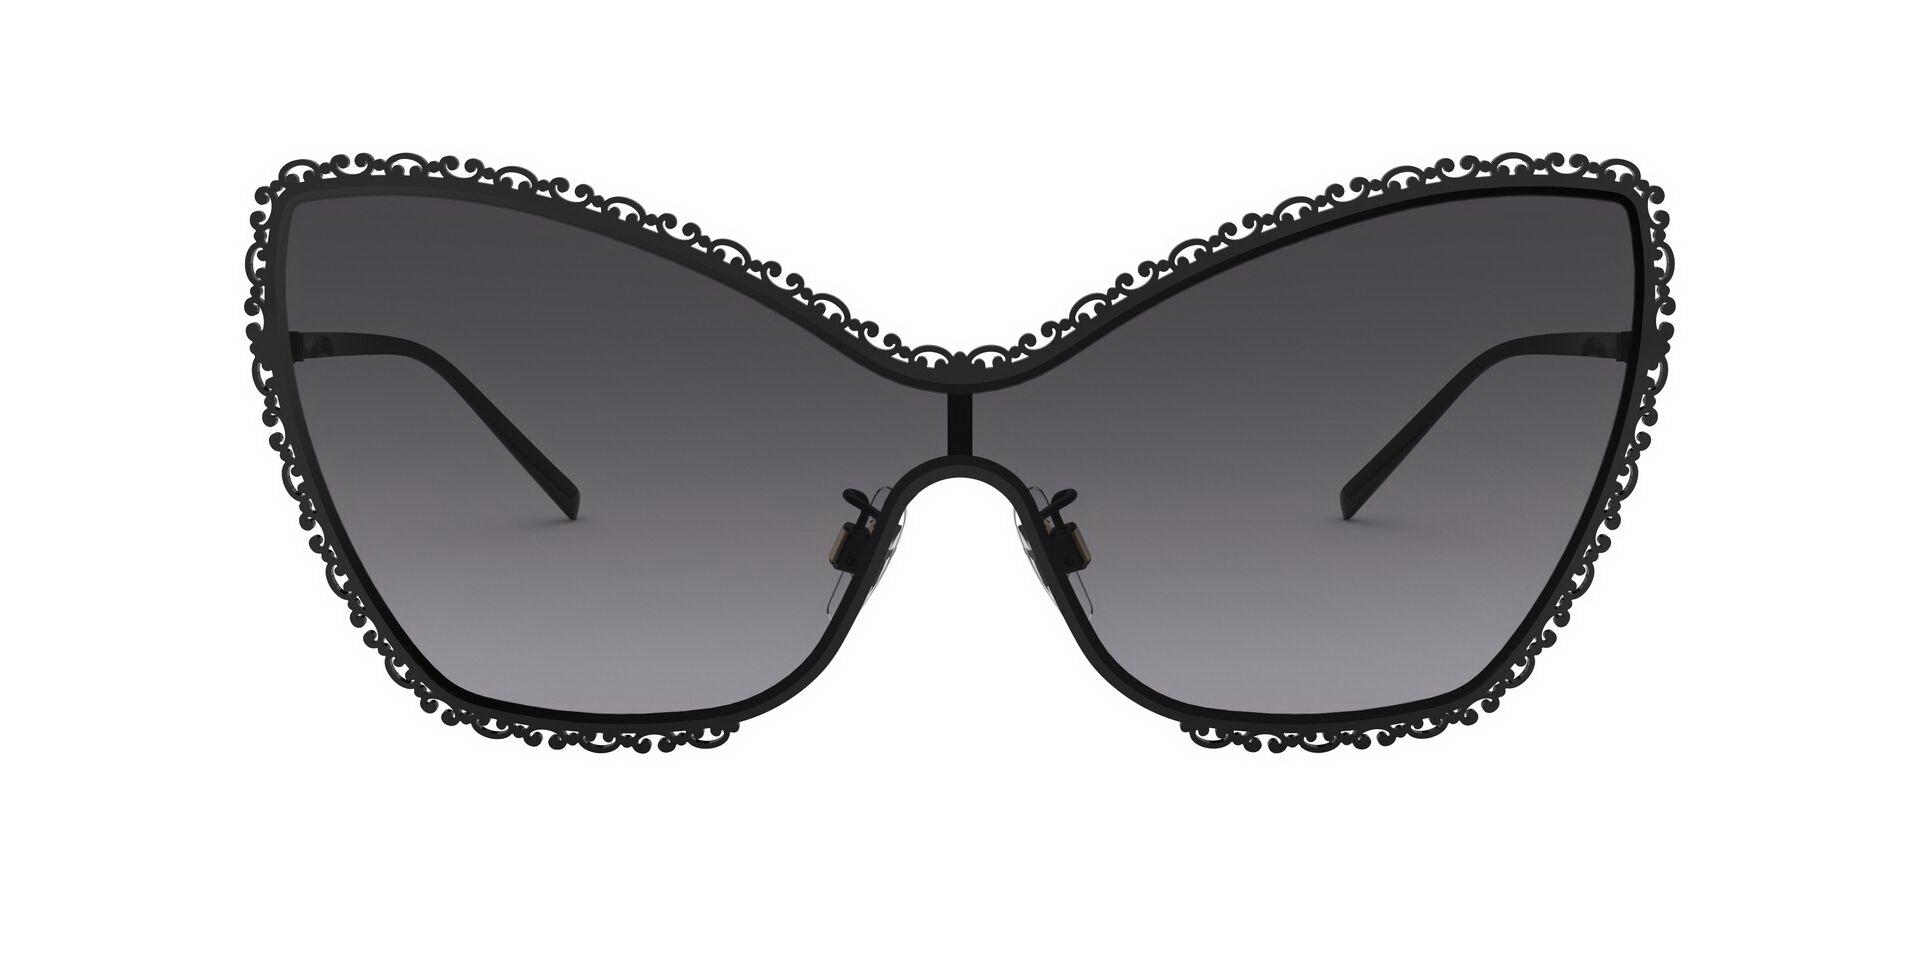 Солнцезащитные очки Очки с/з DOLCE&GABBANA 0DG2240 01/8G фото